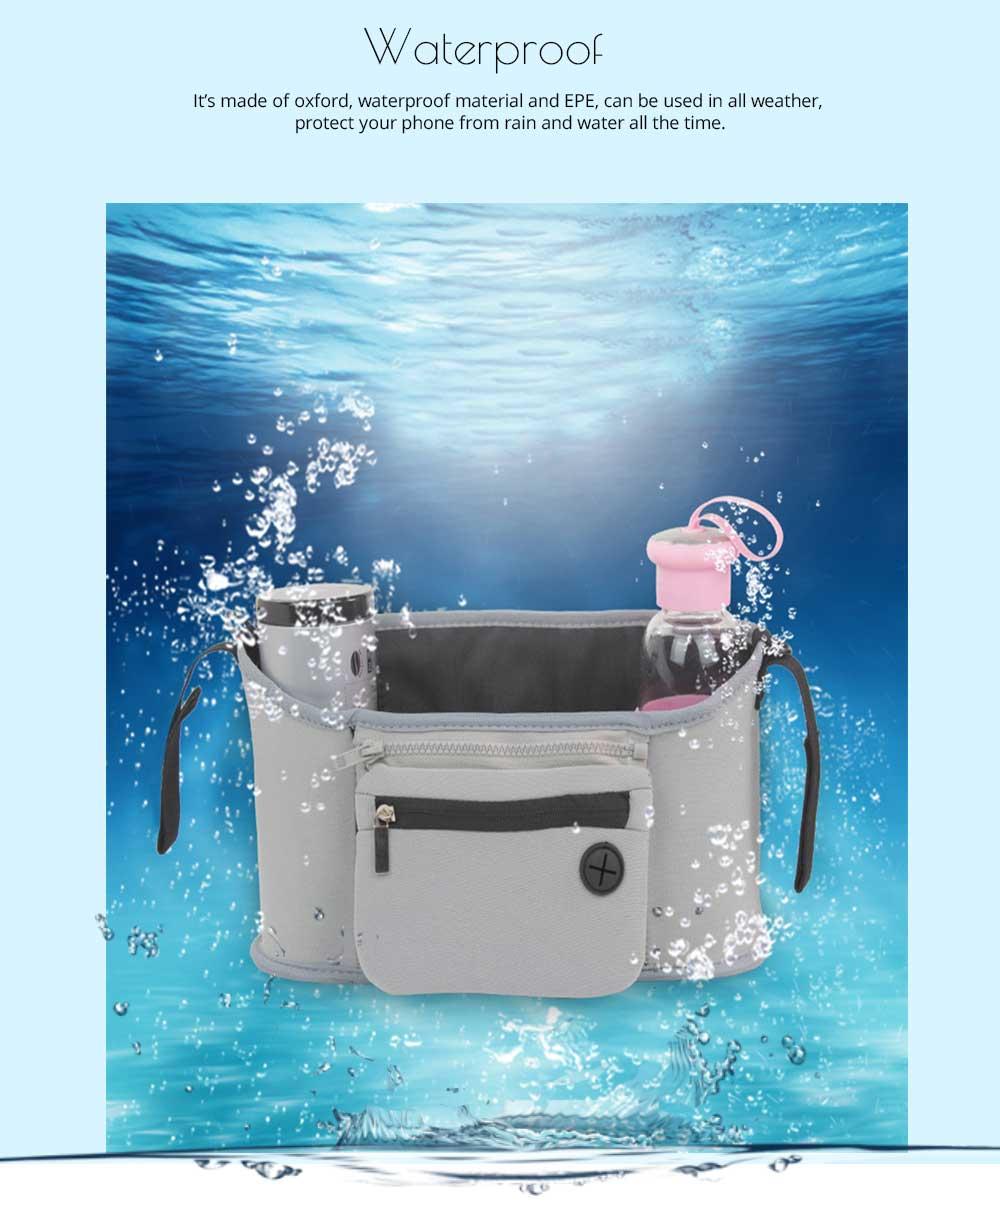 Stroller Bag Holder - Waterproof Keep Warm Stroller Bag Cup Holder with Phone Pram 10